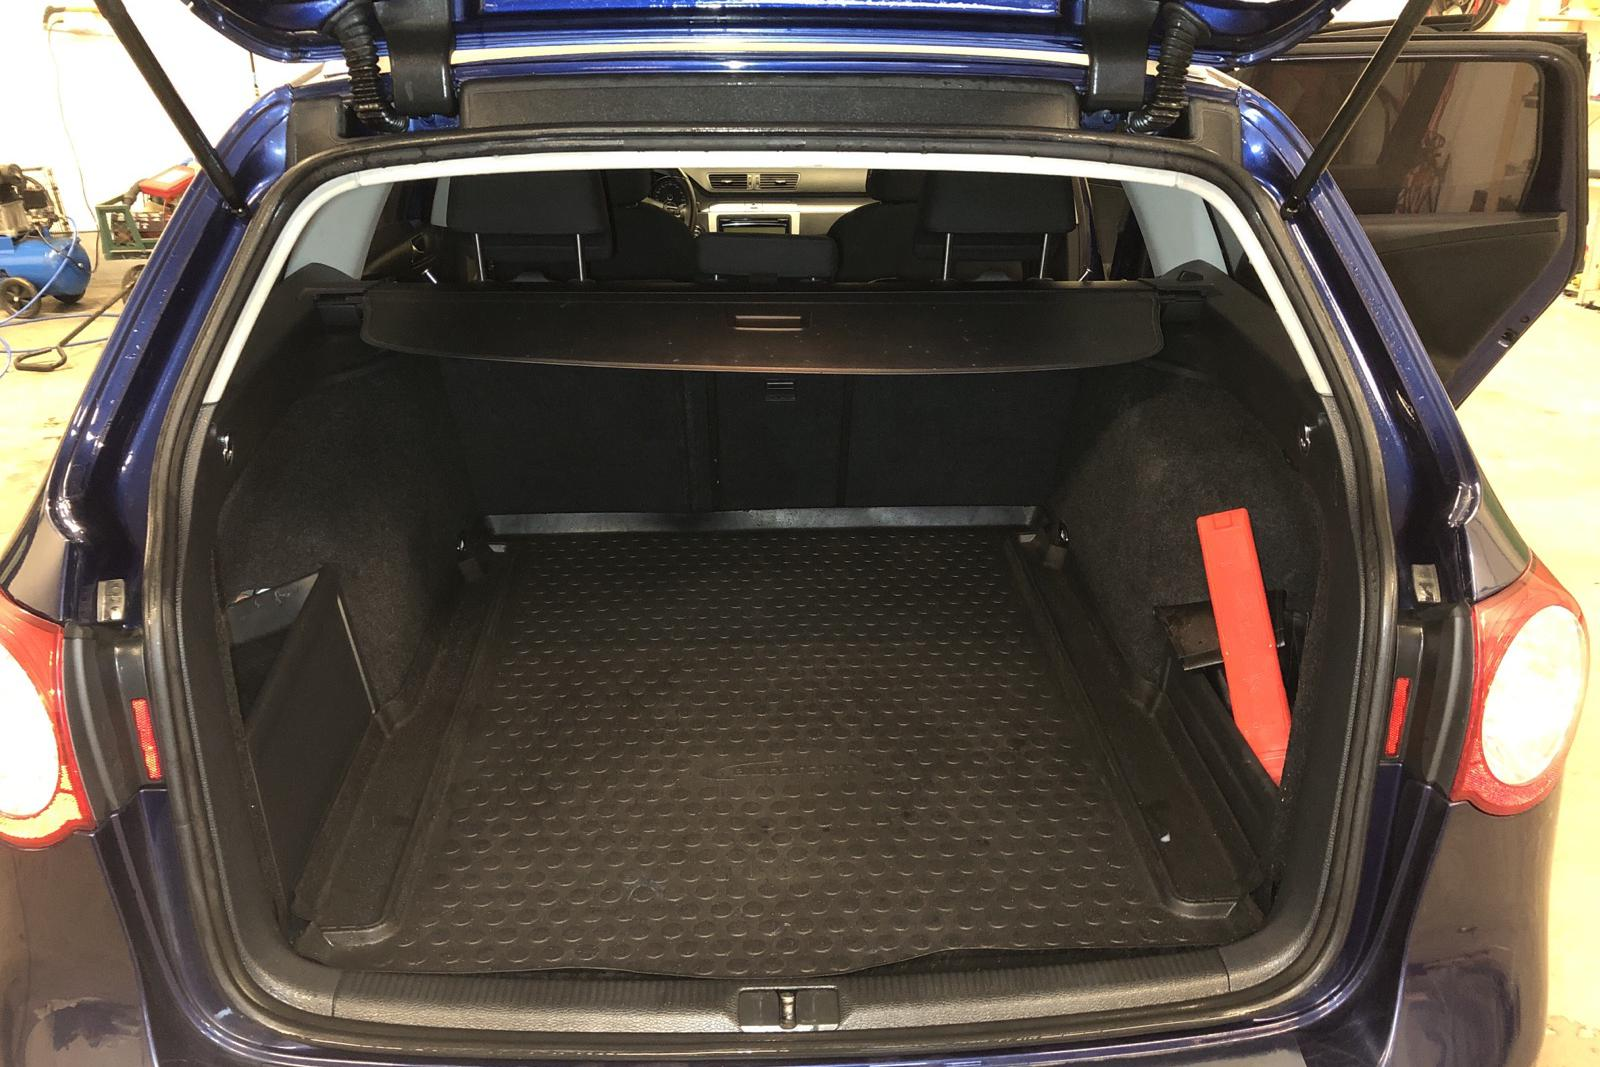 VW Passat 1.4 TSI EcoFuel Variant (150hk) - 157 740 km - Manual - Dark Blue - 2010